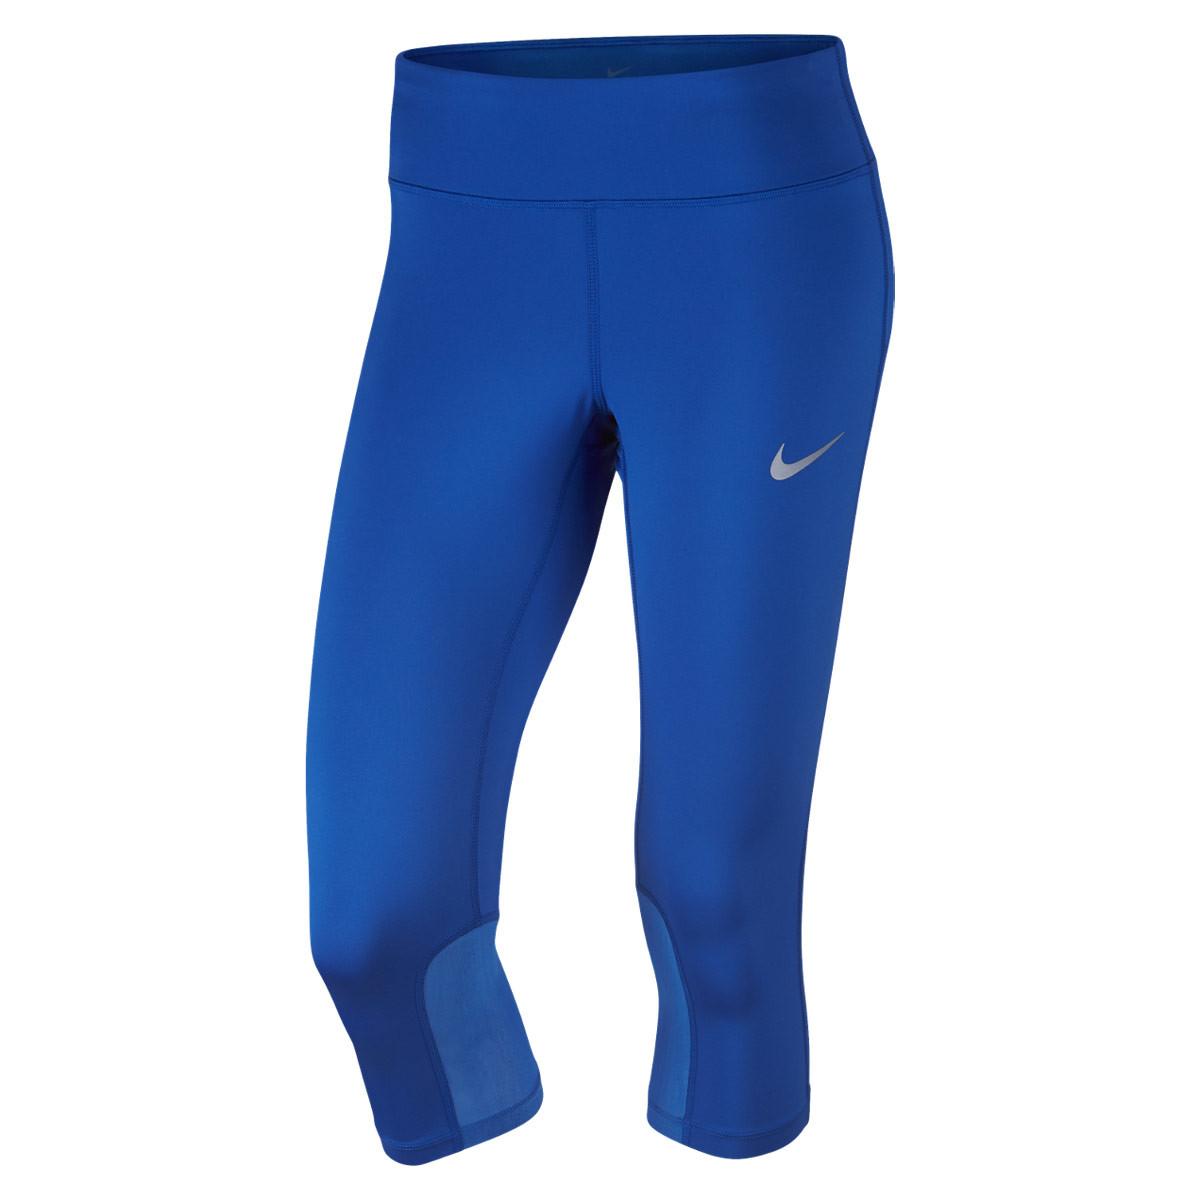 c22e23bc6994c Nike Power Epic Running Capri - Running trousers for Women - Blue   21RUN